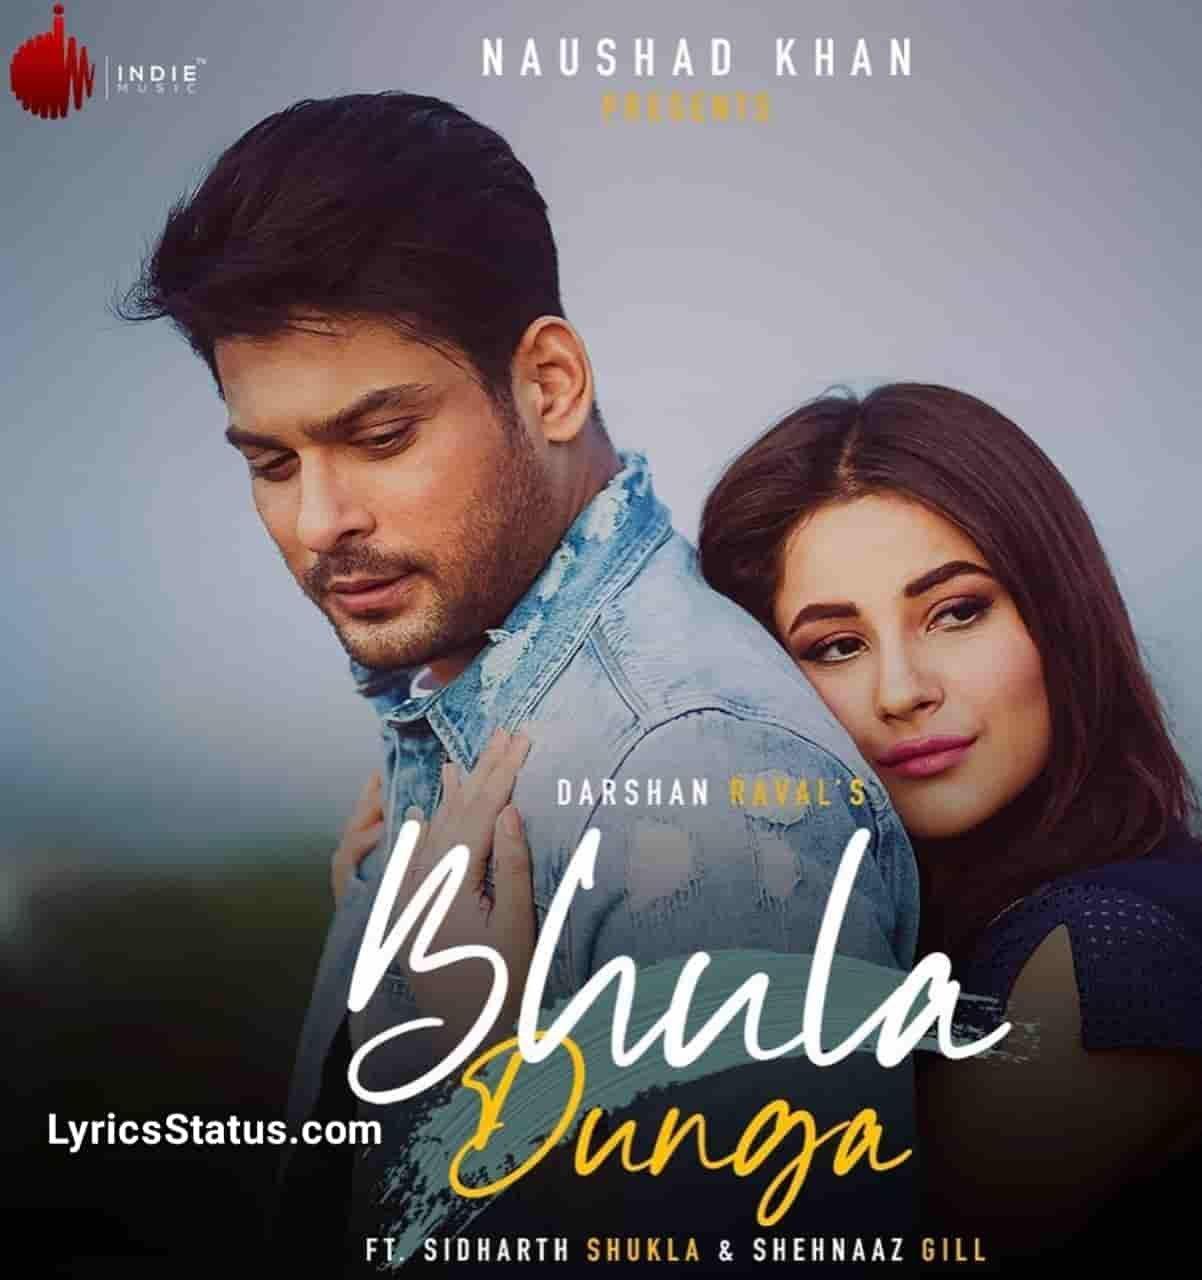 Darshan Raval New Song Bhula Dunga Lyrics Status Download New Hindi Song Ik pal mein tumko main bhula dunga Dil todne ki yeh saza doonga